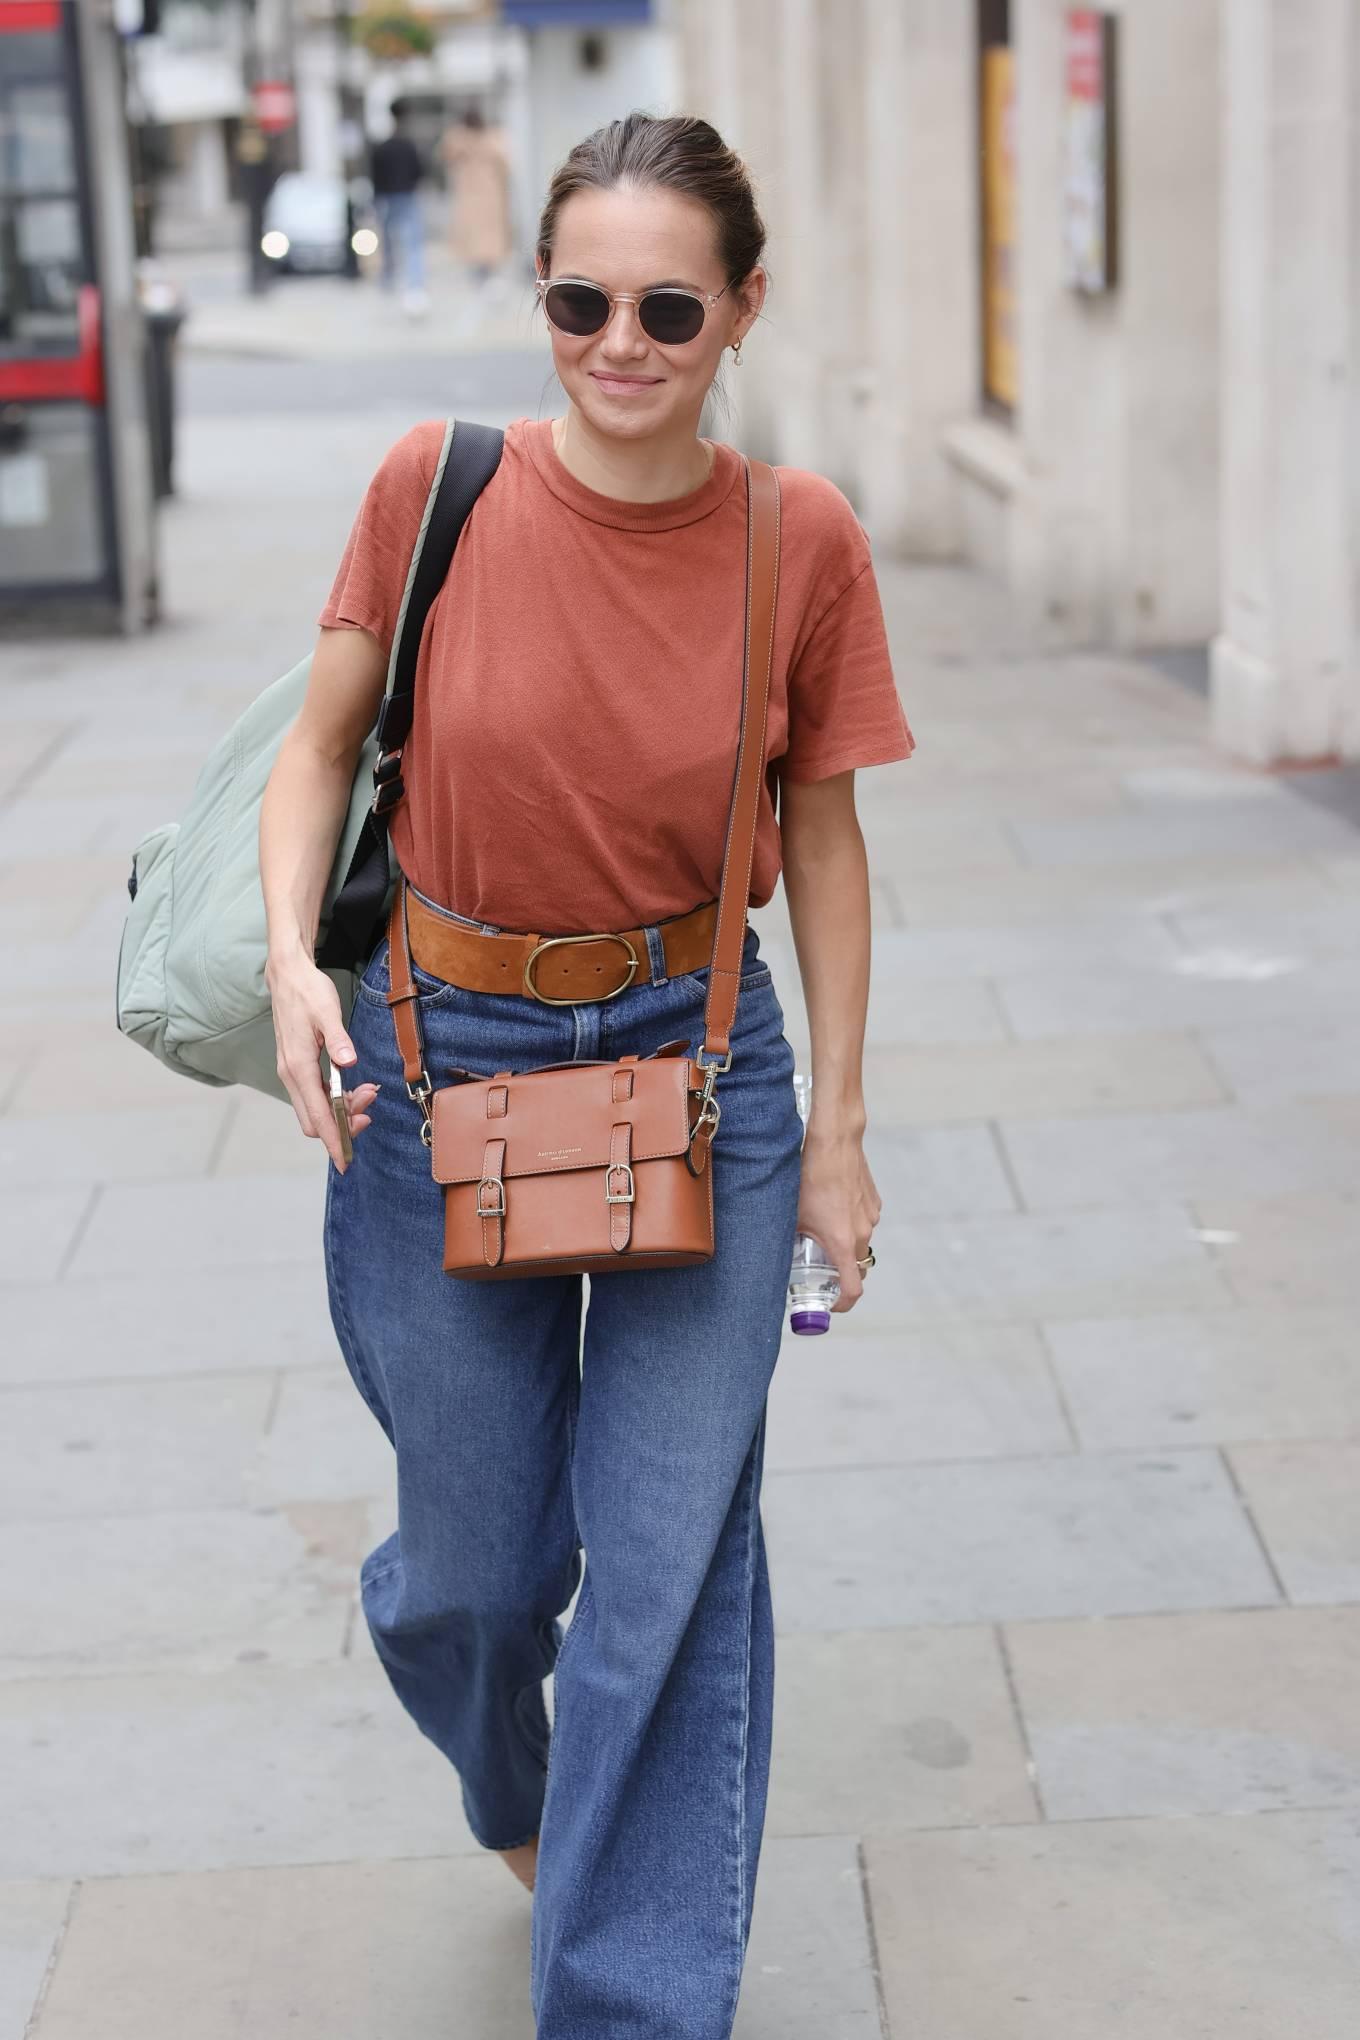 Kara Tointon 2021 : Kara Tointon – In flared denim pants stepping out in London-03